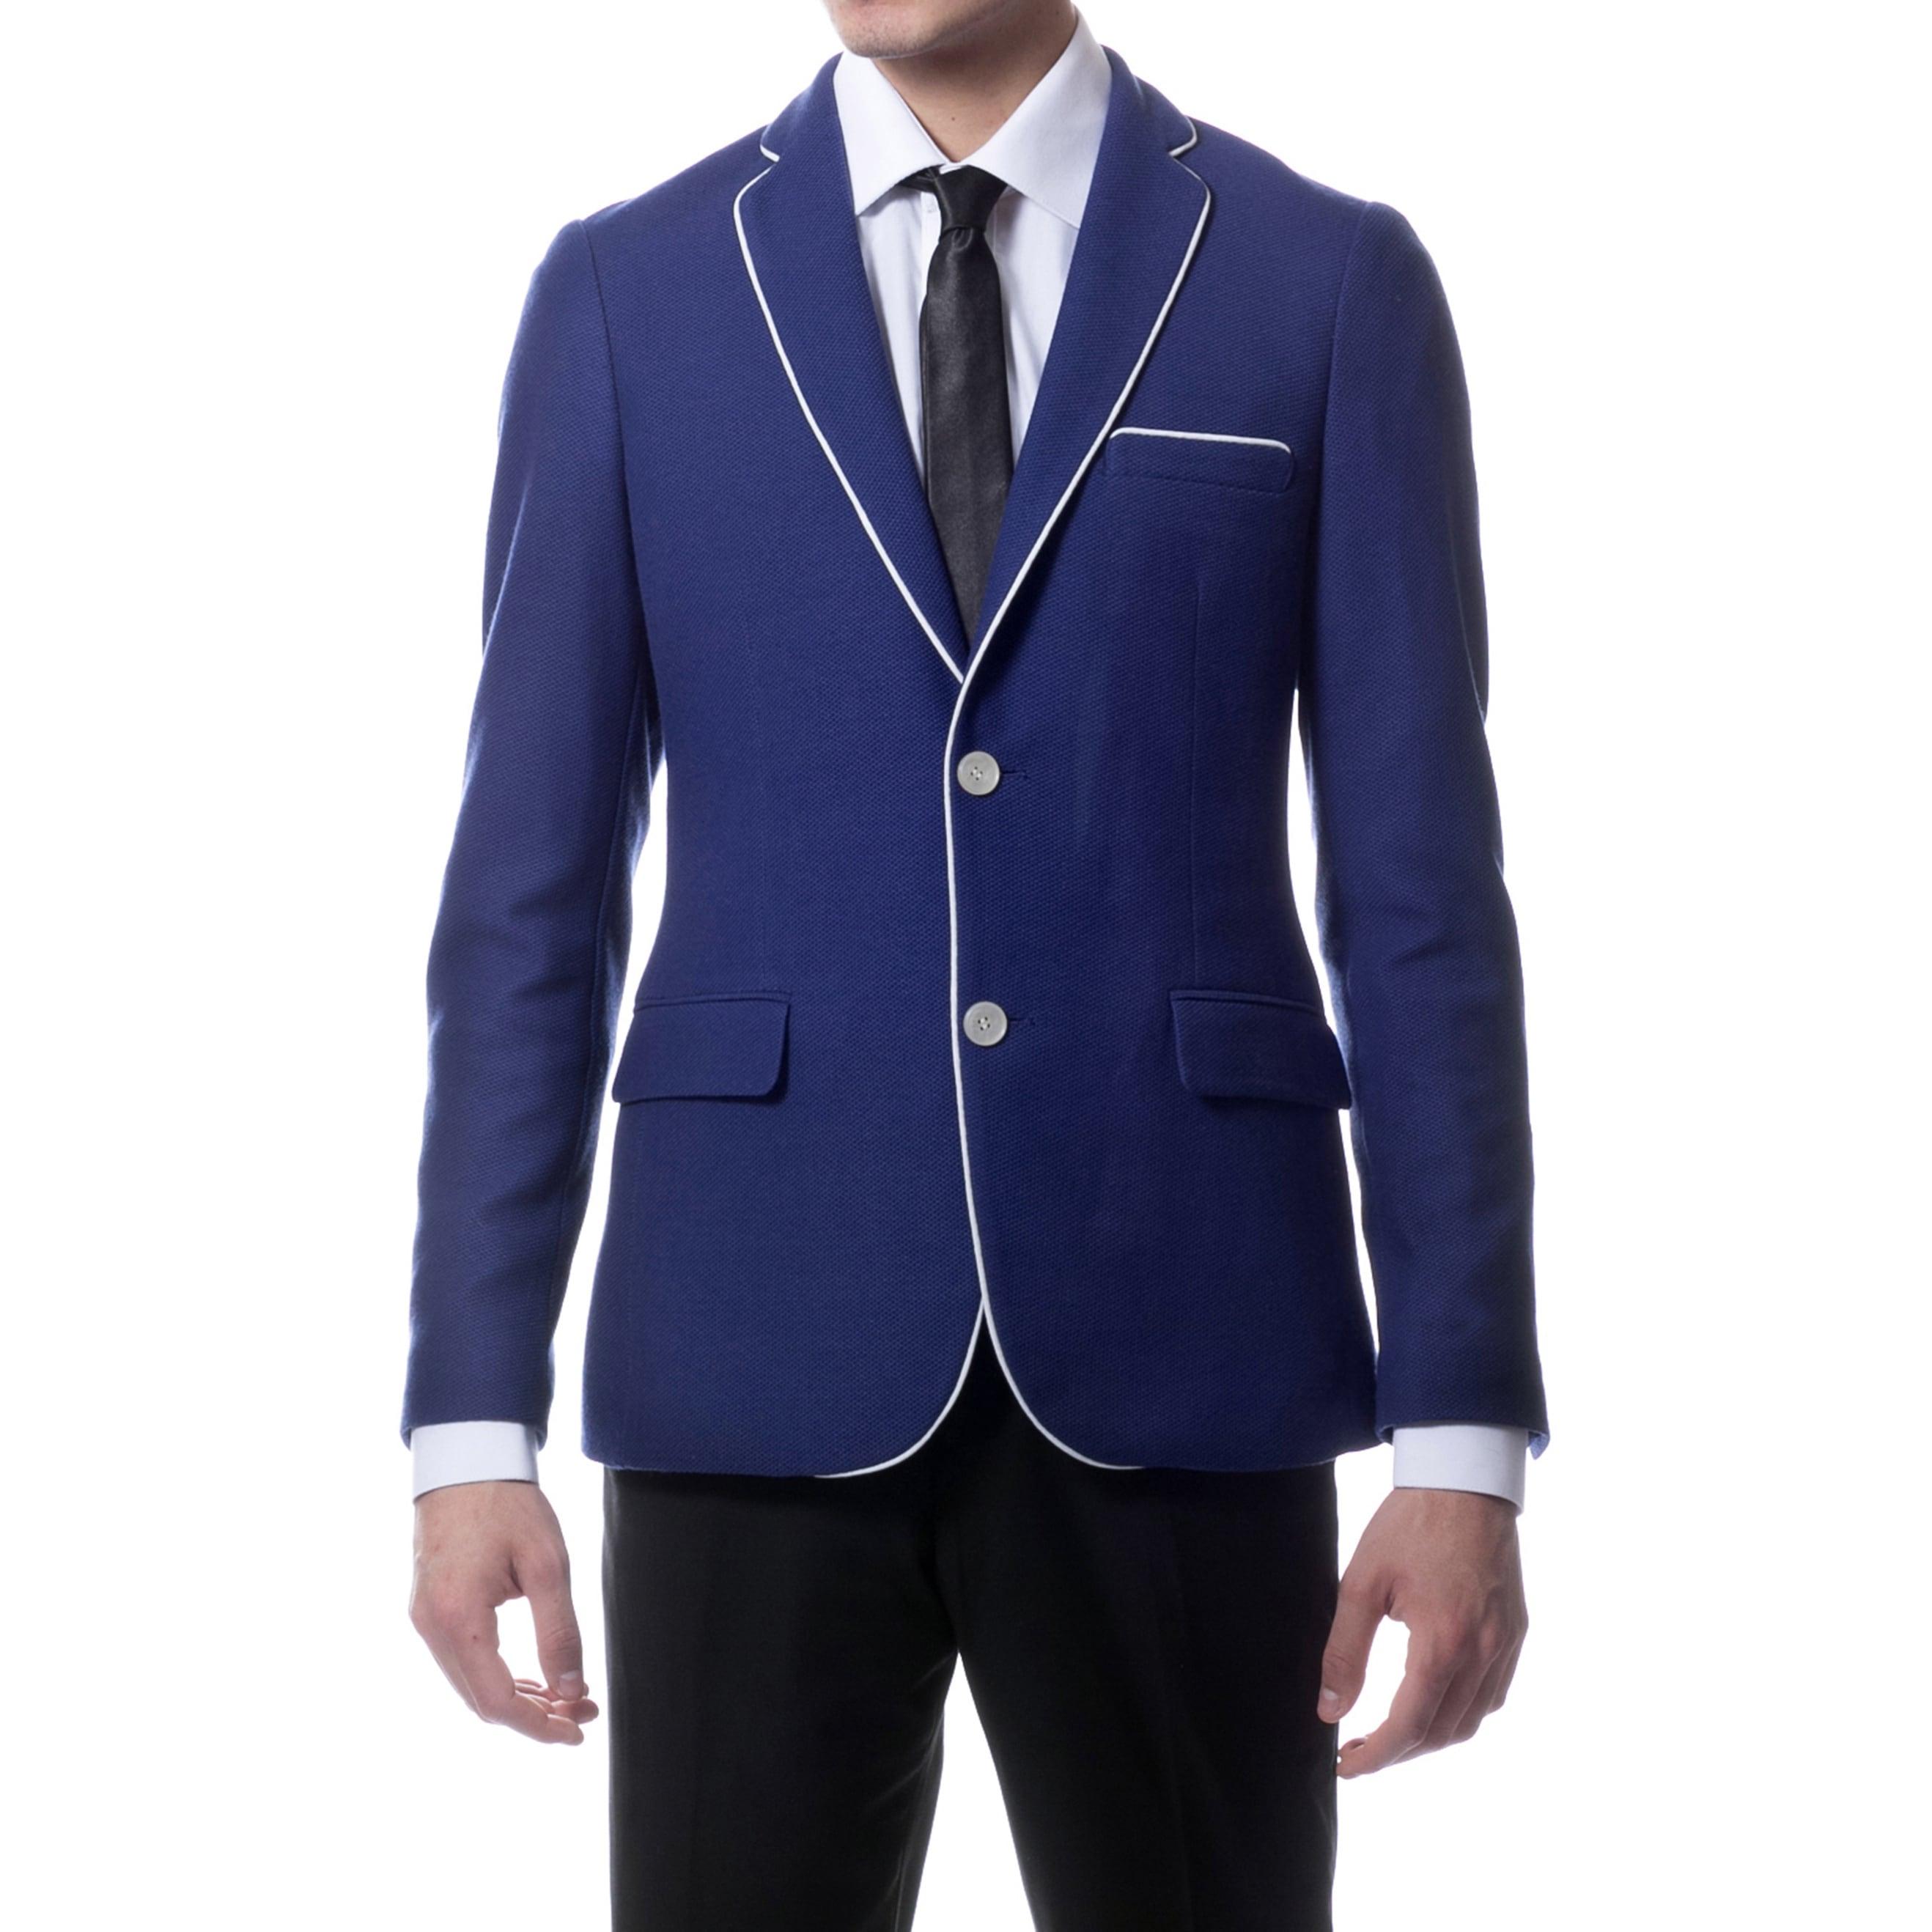 Ferrecci® Zonettie by Ferrecci Men's Slim Fit Navy Blue Knit Traveler Blazer Jacket at Sears.com